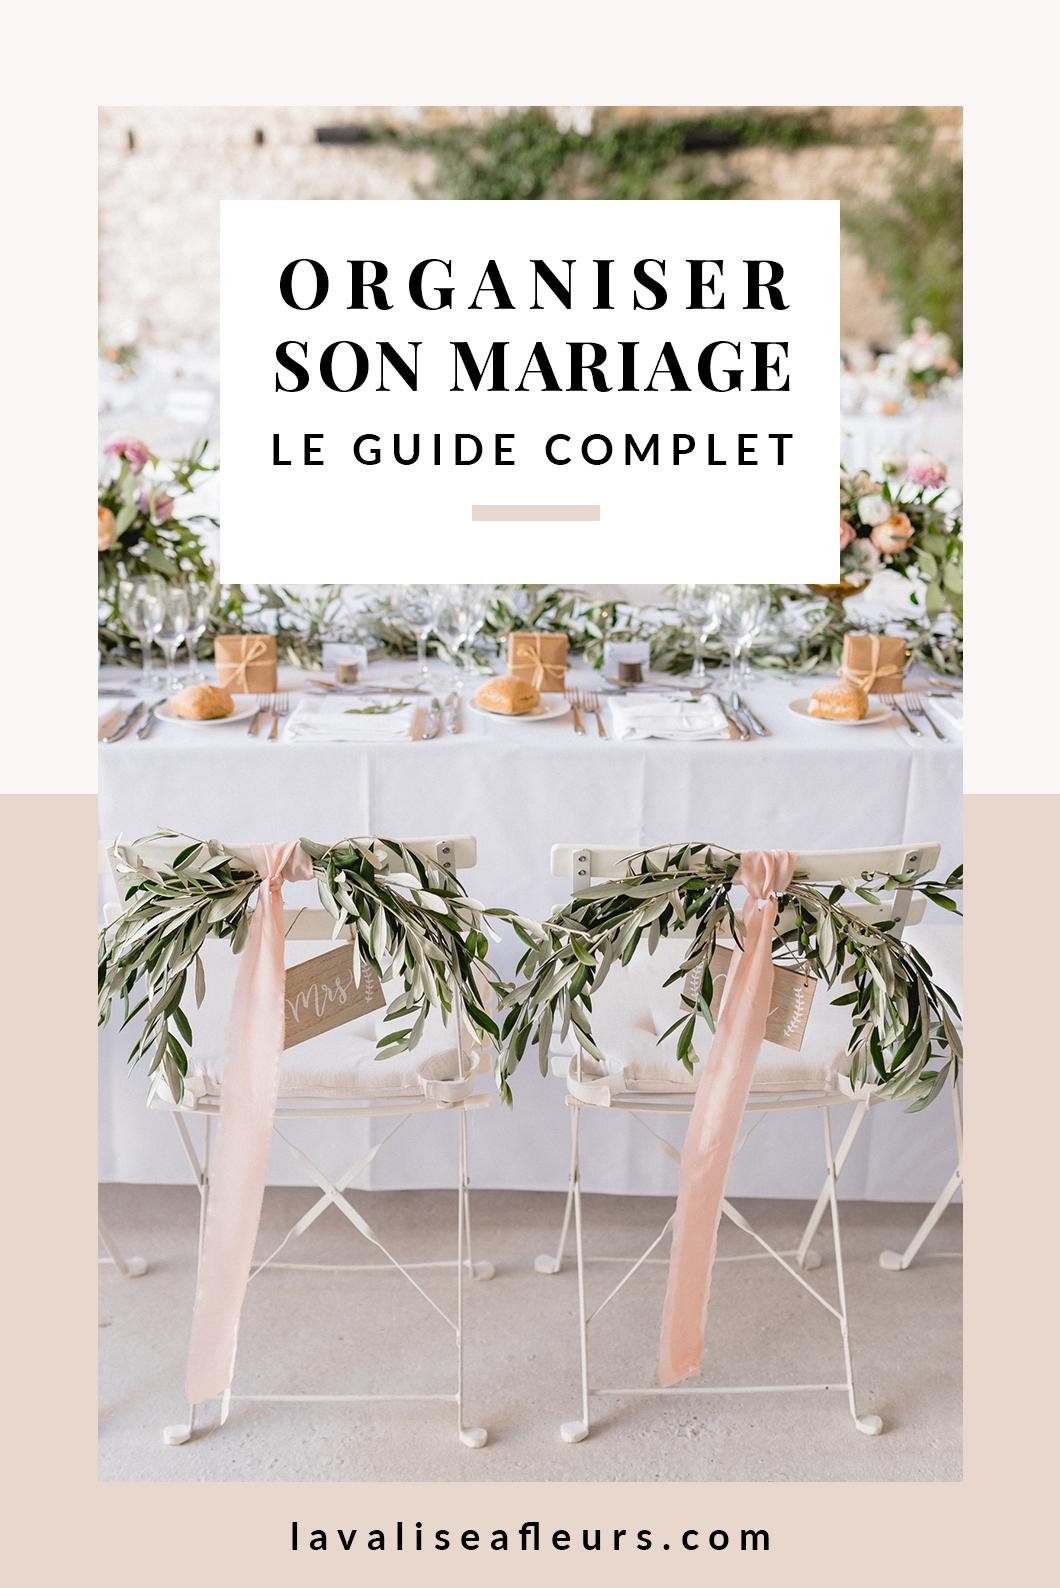 Le guide complet pour organiser son mariage